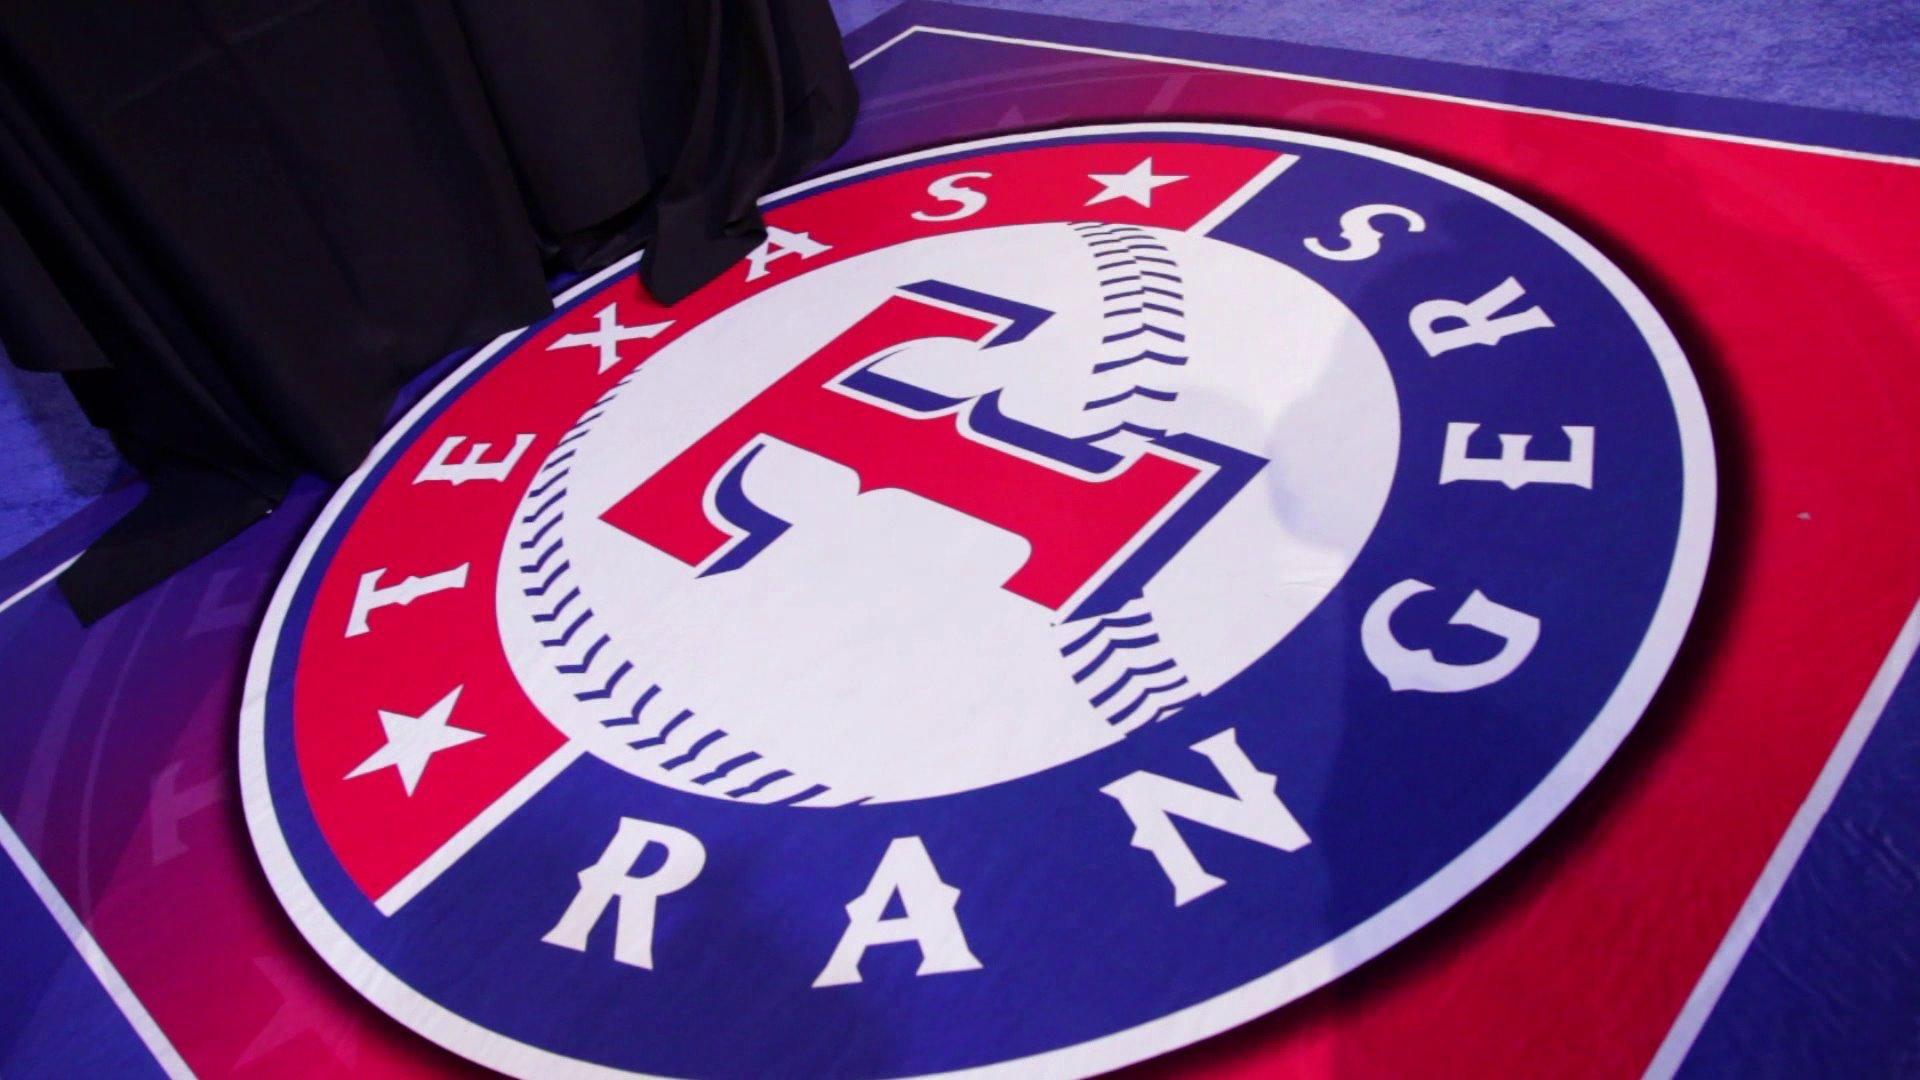 TEXAS RANGERS baseball mlb 61 wallpaper 1920x1080 319035 1920x1080